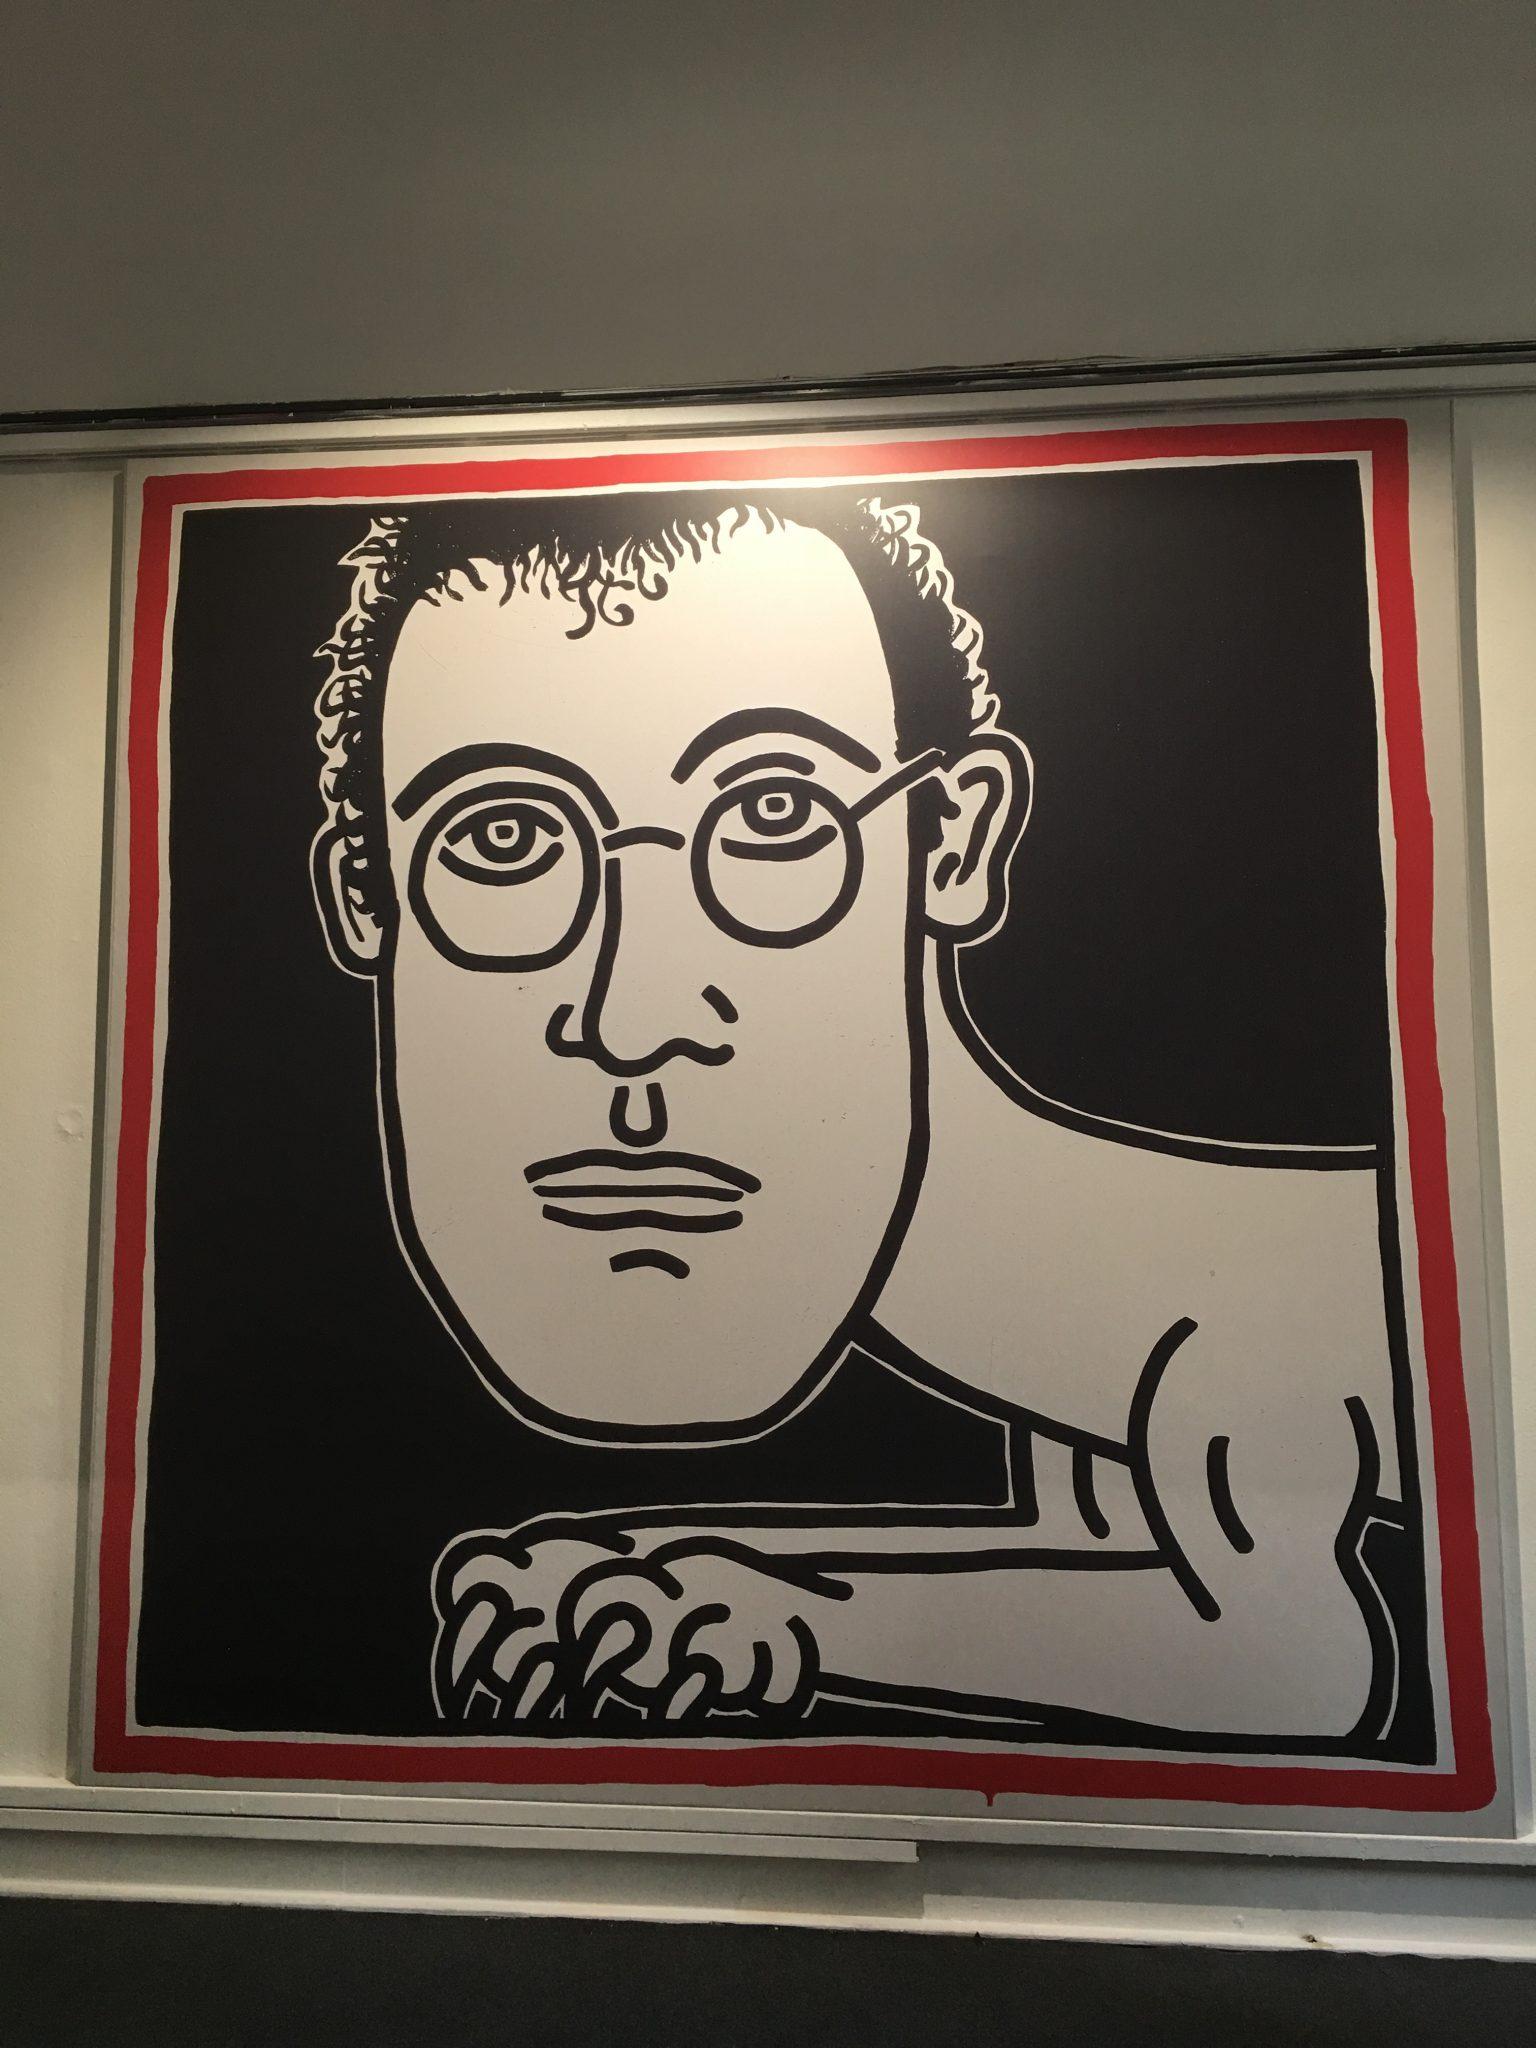 About art. L'Umanesimo urbano di Keith Haring a Milano